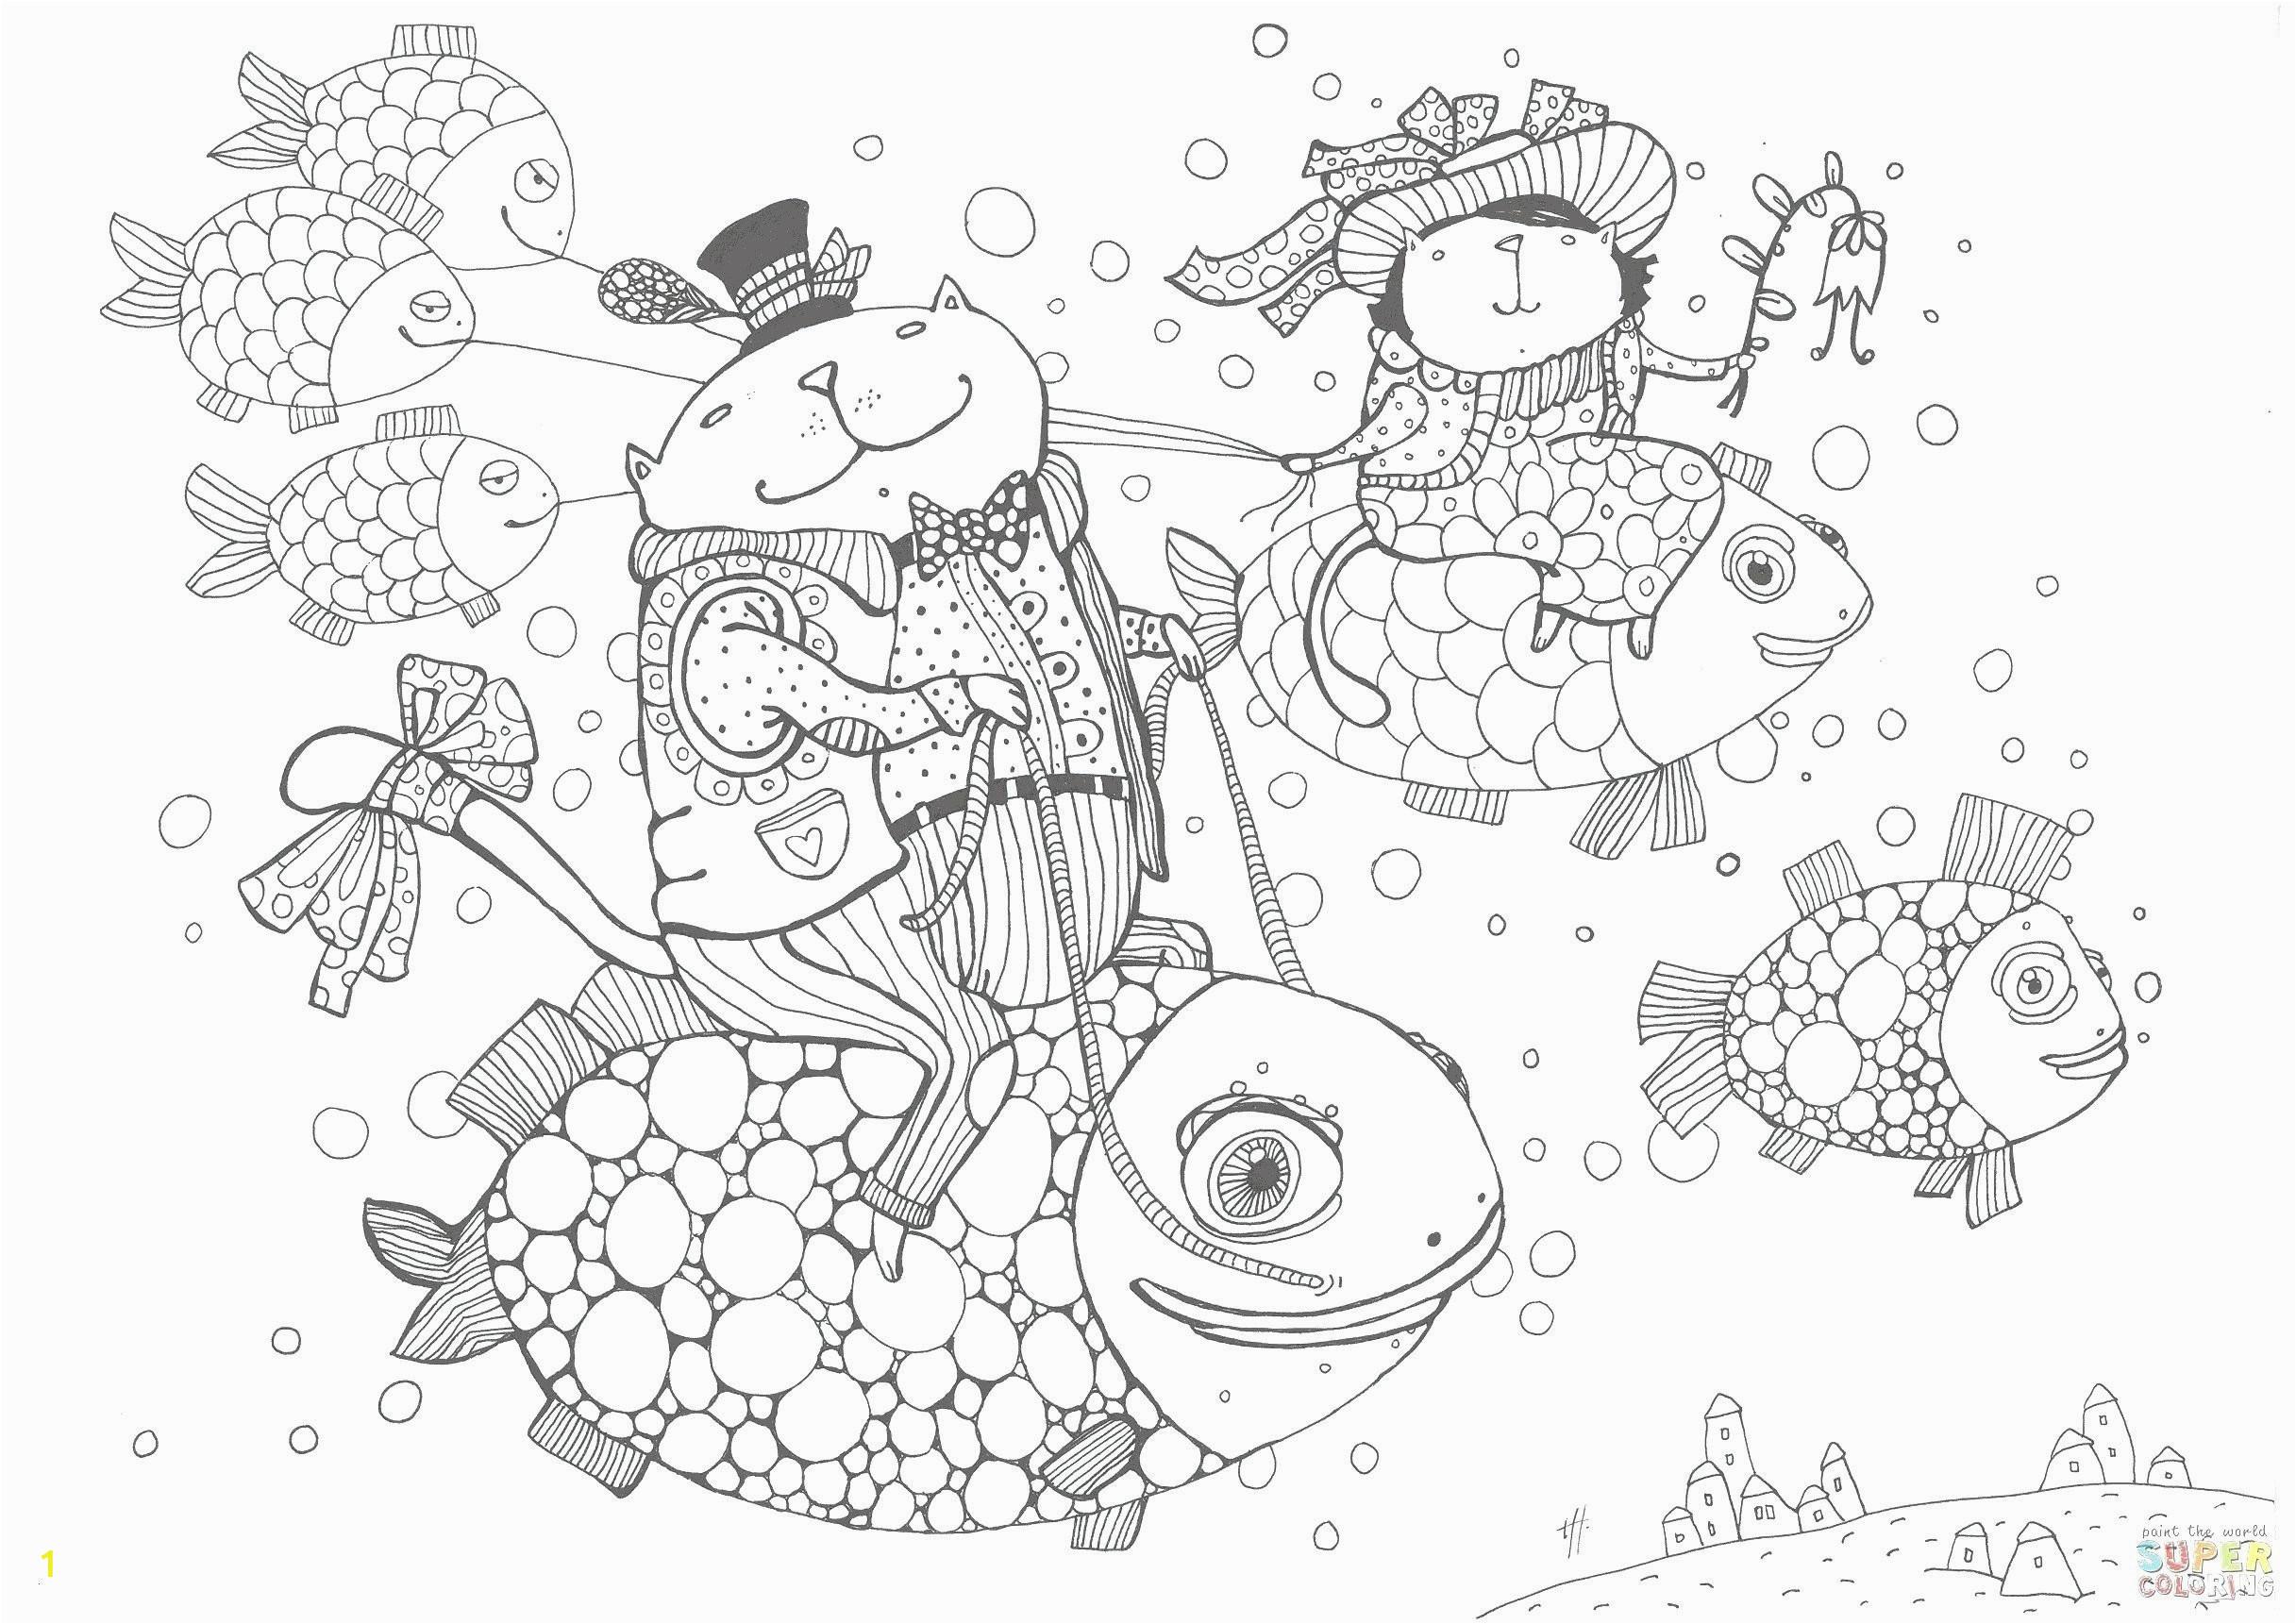 ninja turtles coloring best of fresh lovely to print safewaysheet tmnt turtle pictures color sheets teenage mutant free